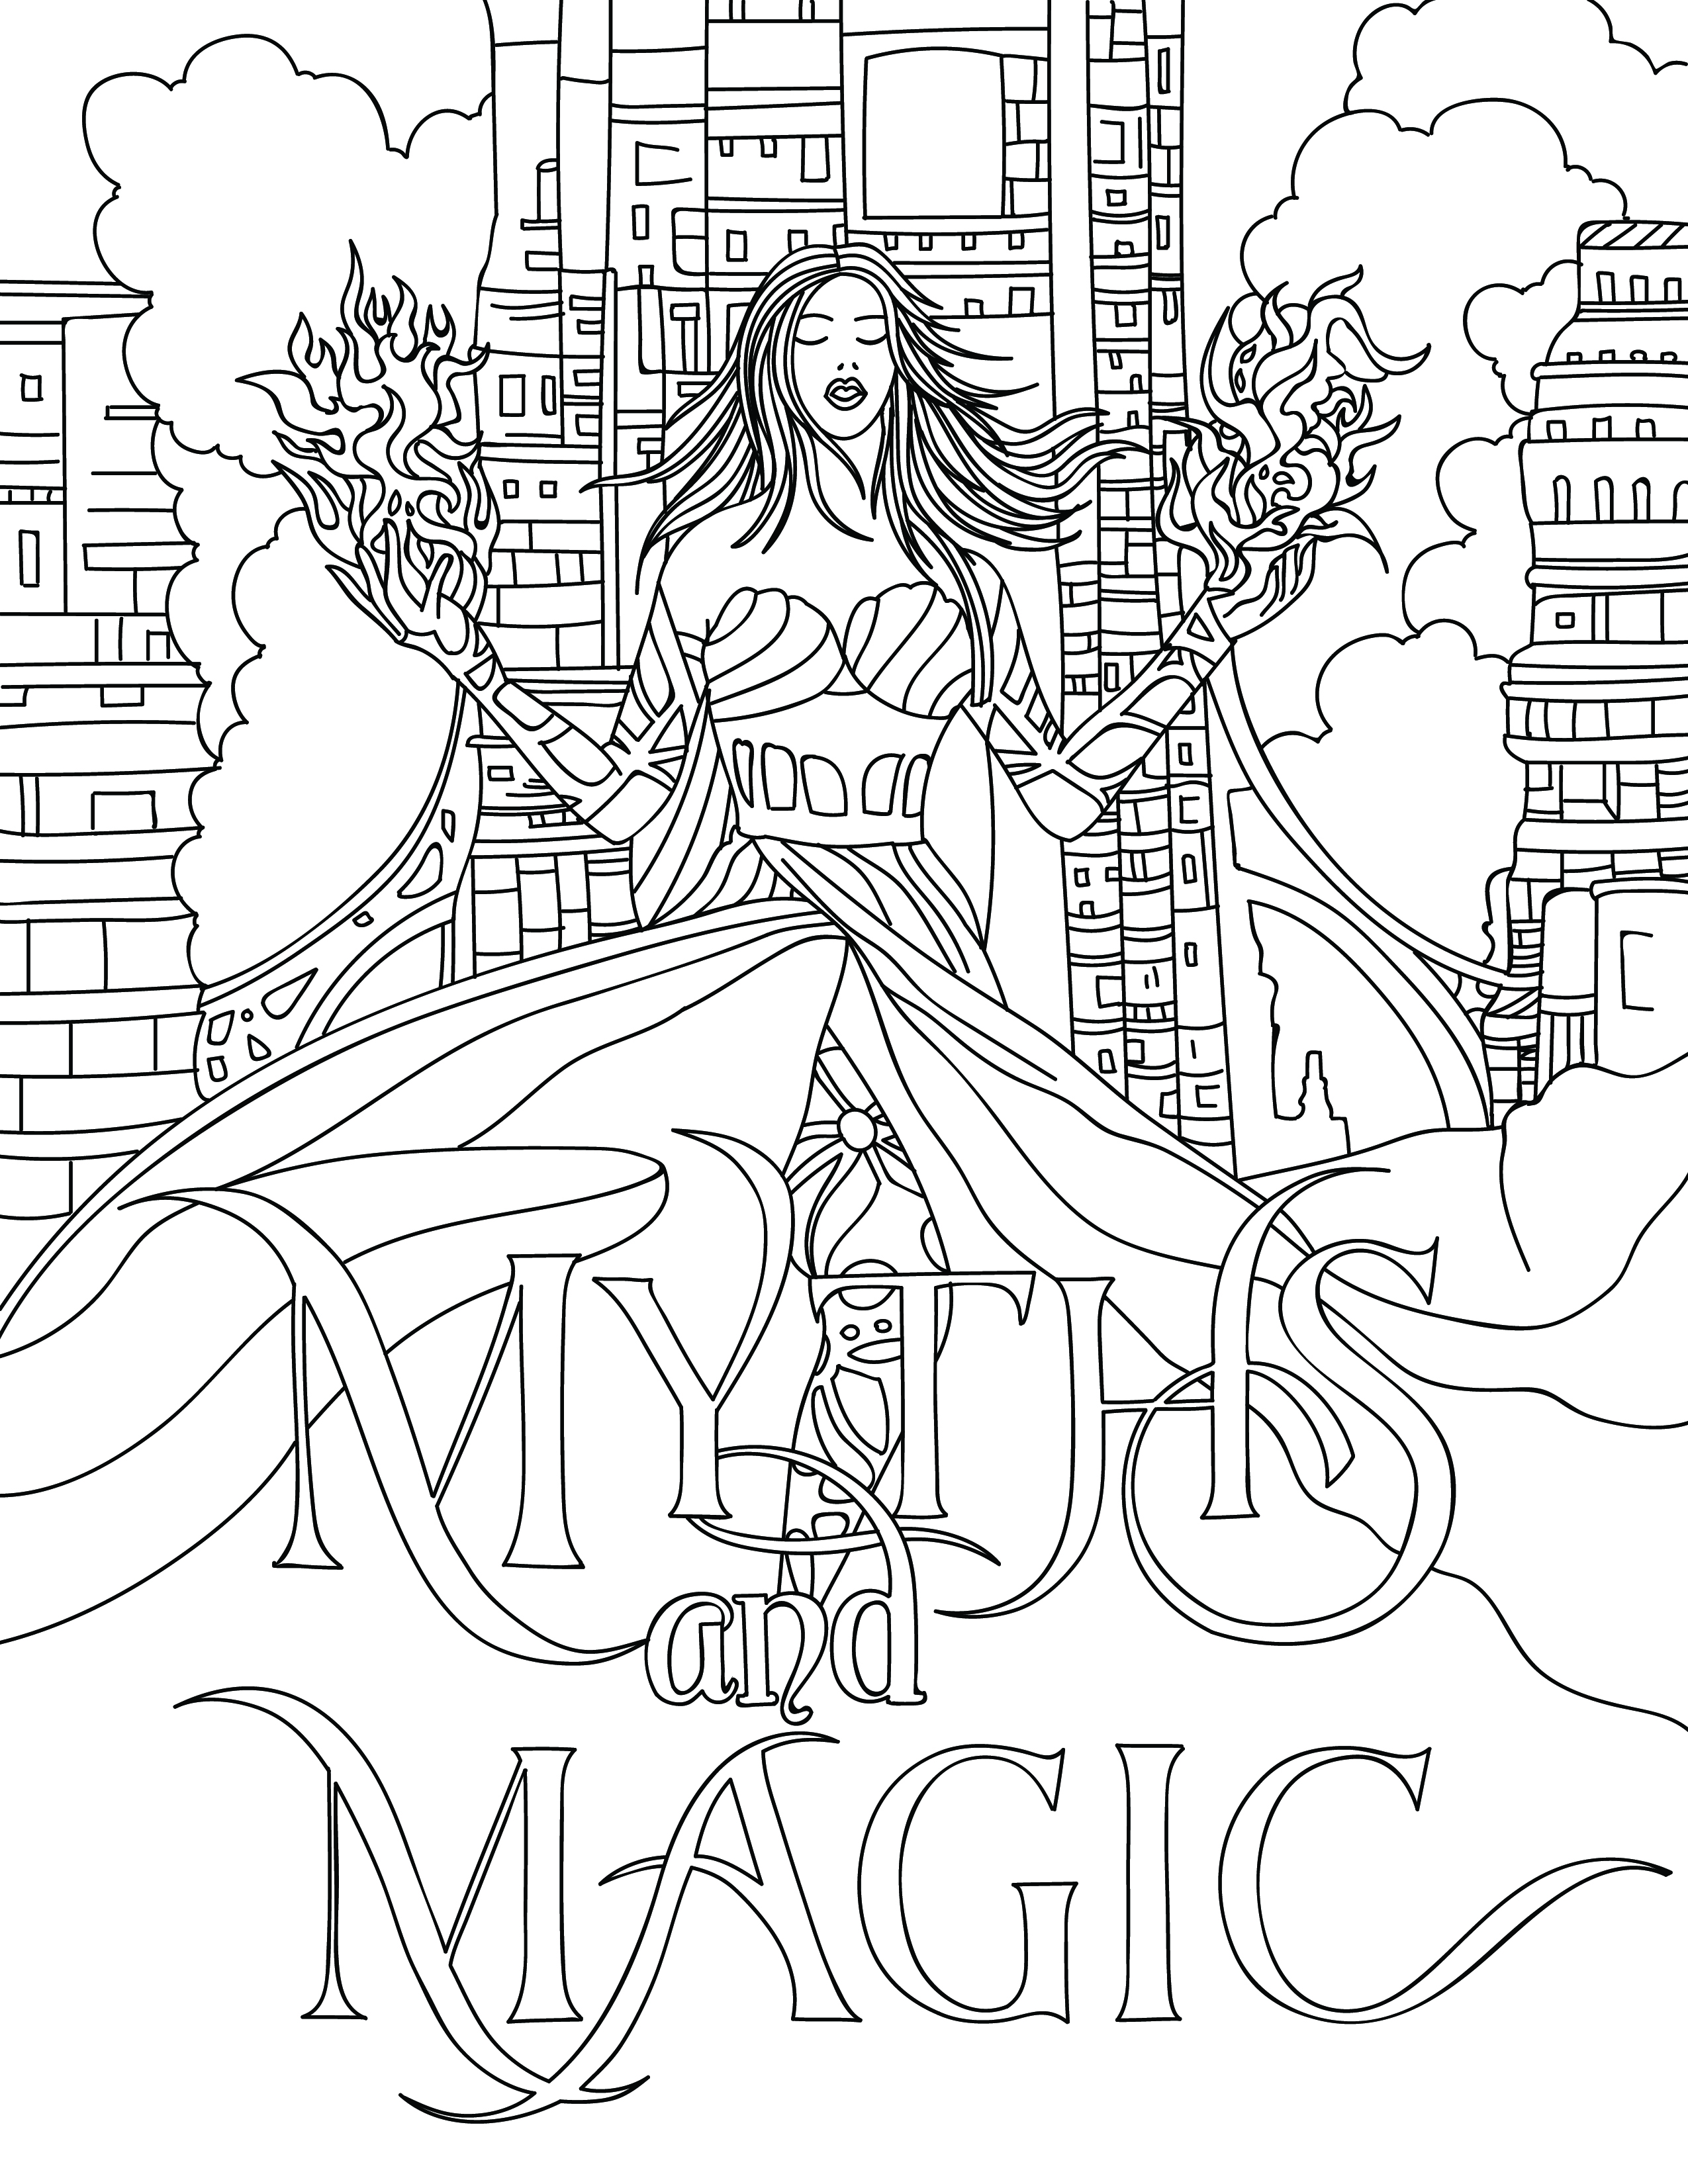 Myths & Magic Coloring Book